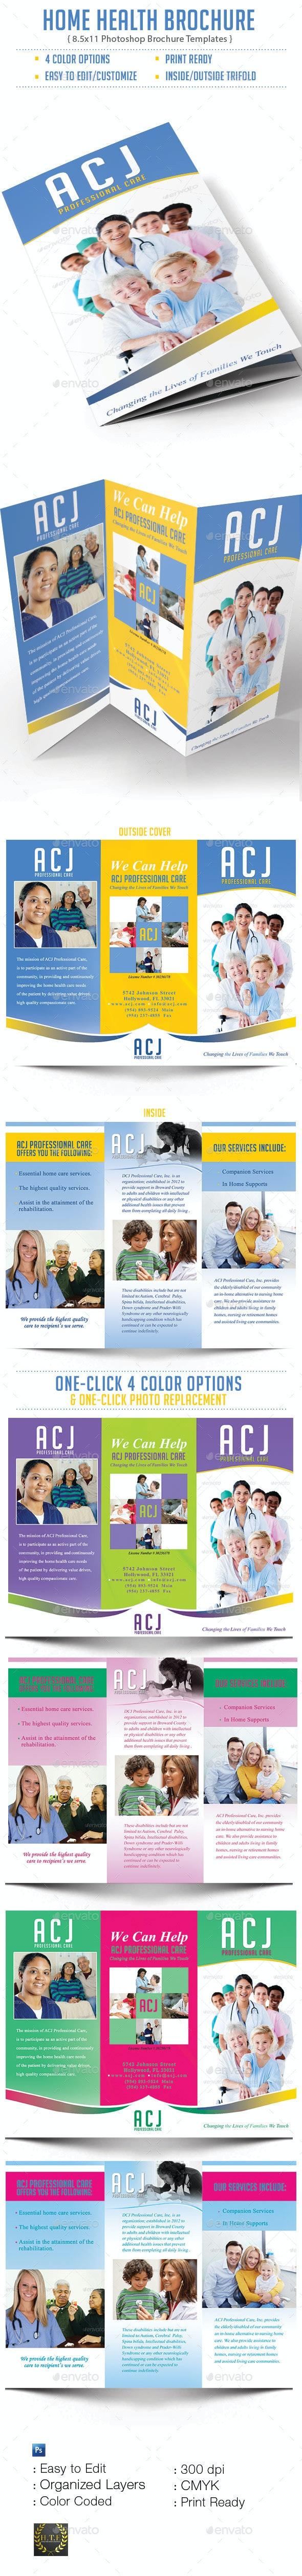 Home Health Brochure - Brochures Print Templates